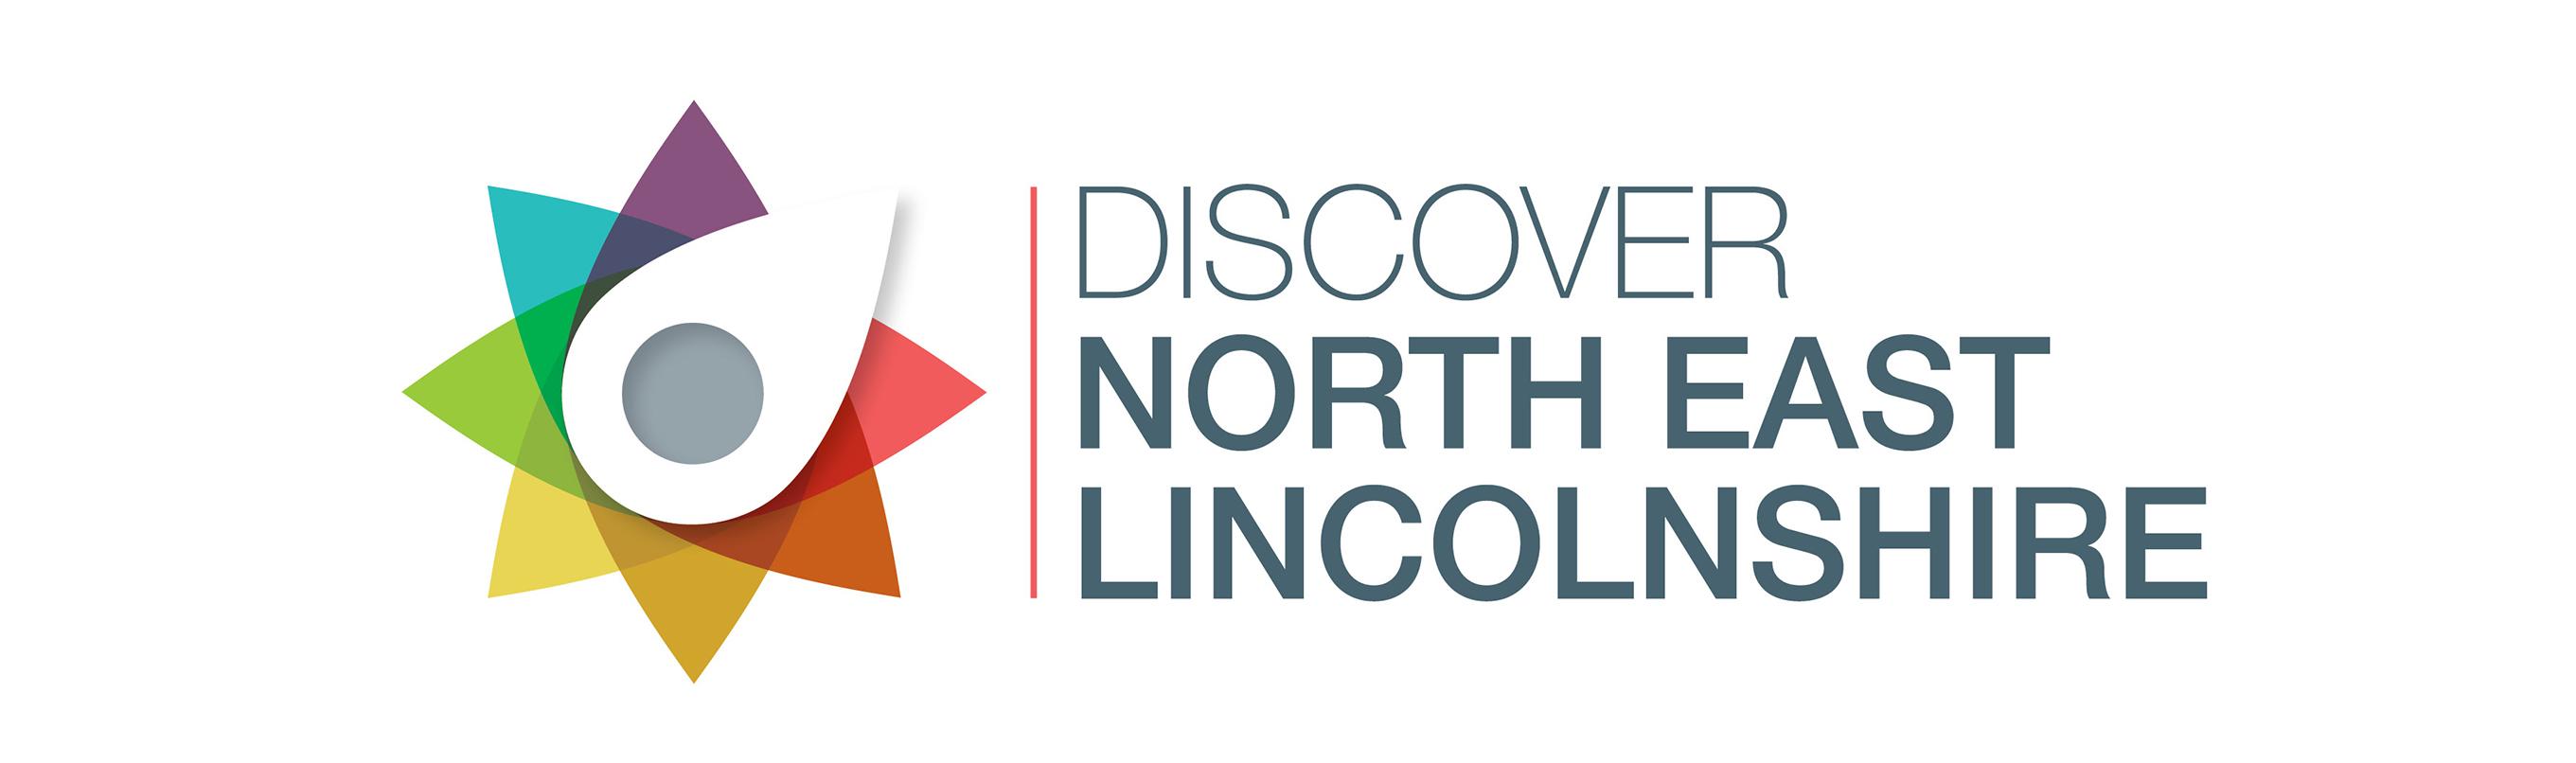 DiscoverNEL logo